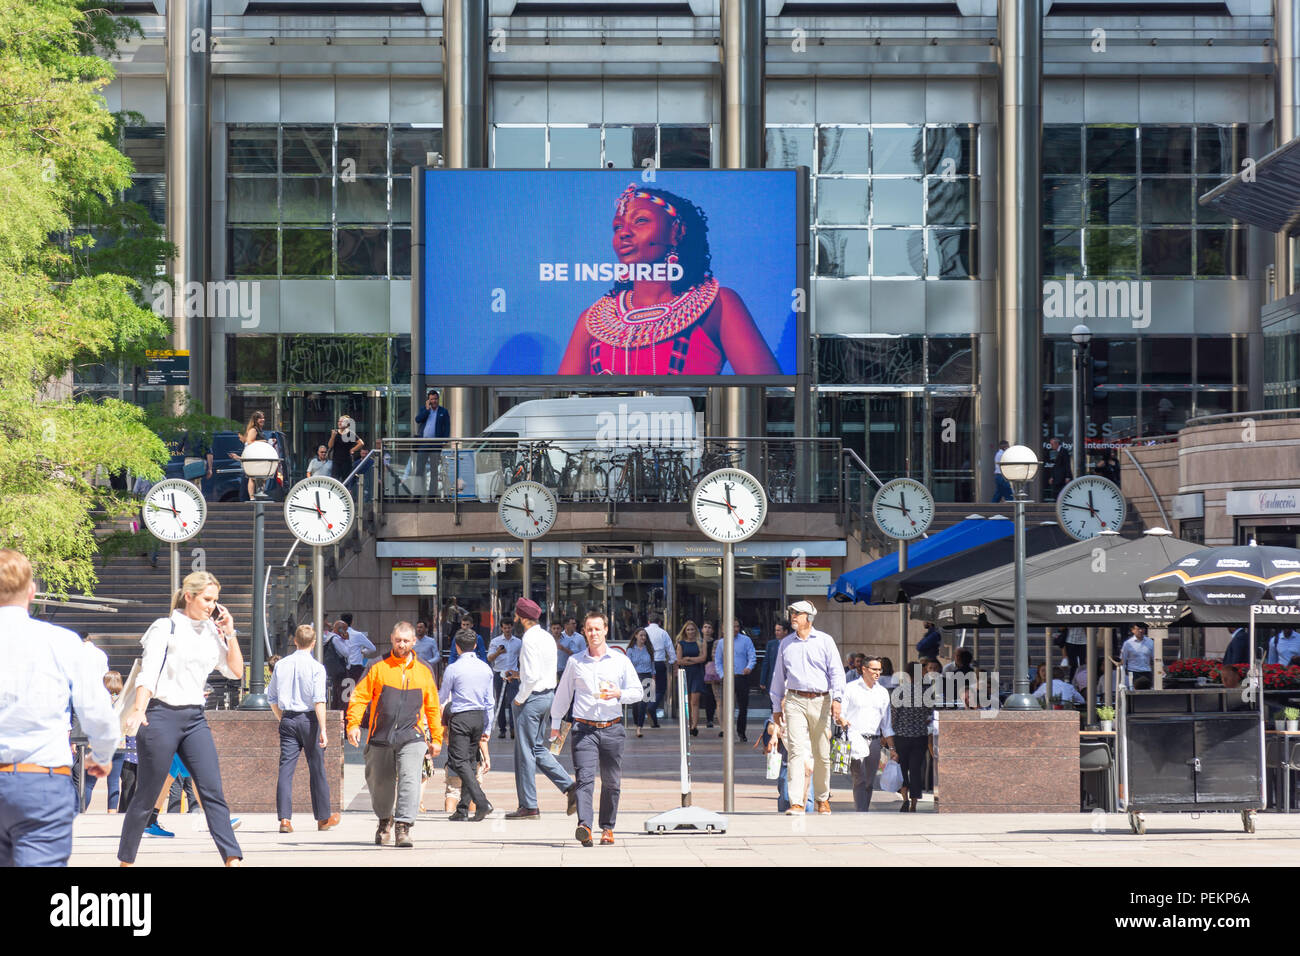 Reuters Plaza, Canary Wharf, London Borough of Tower Hamlets, London, Greater London, England, United Kingdom - Stock Image